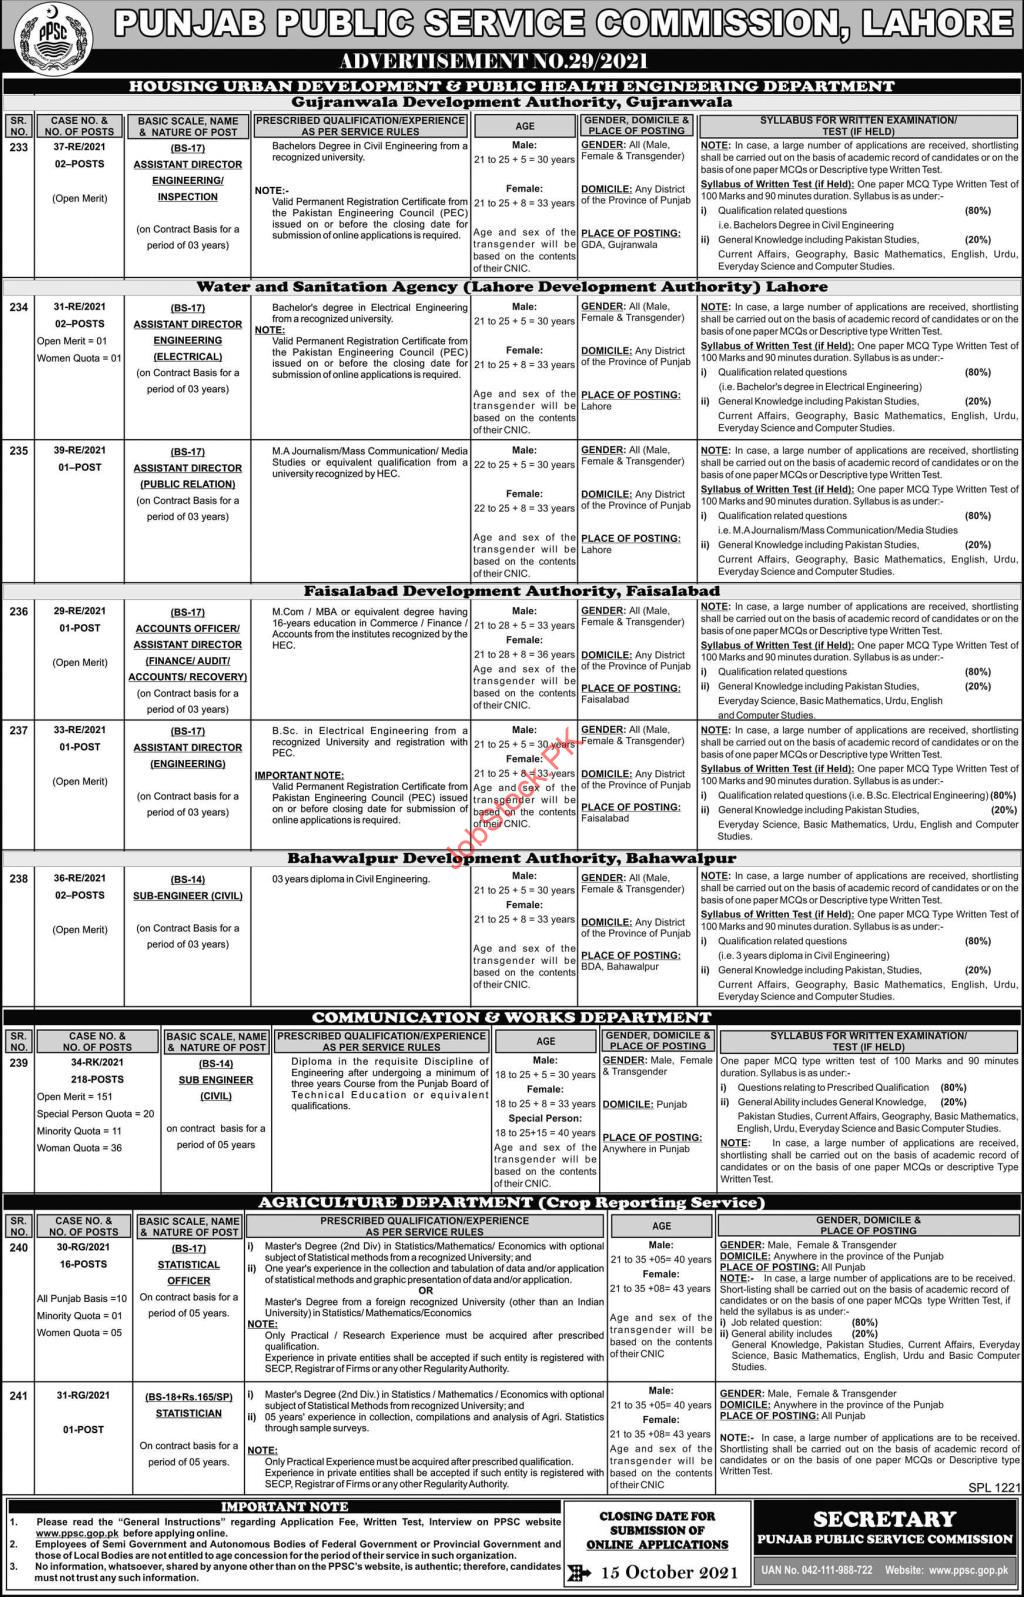 ppsc jobs advertisement 29 2021